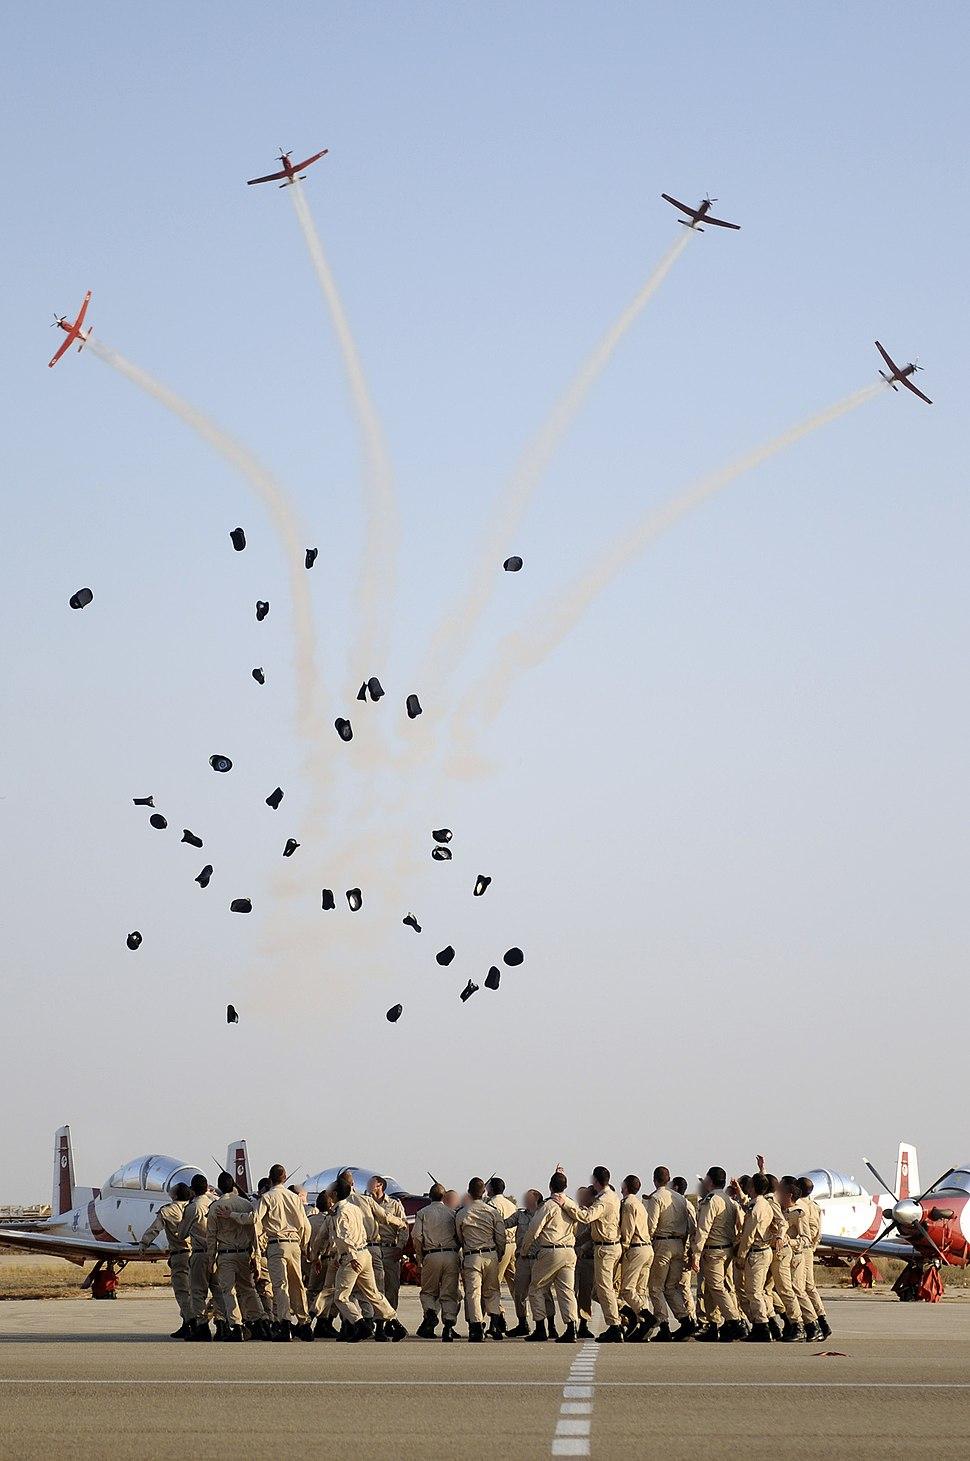 Flickr - Israel Defense Forces - Flight School Graduates Receive Their New Rankings as Air Force Officers